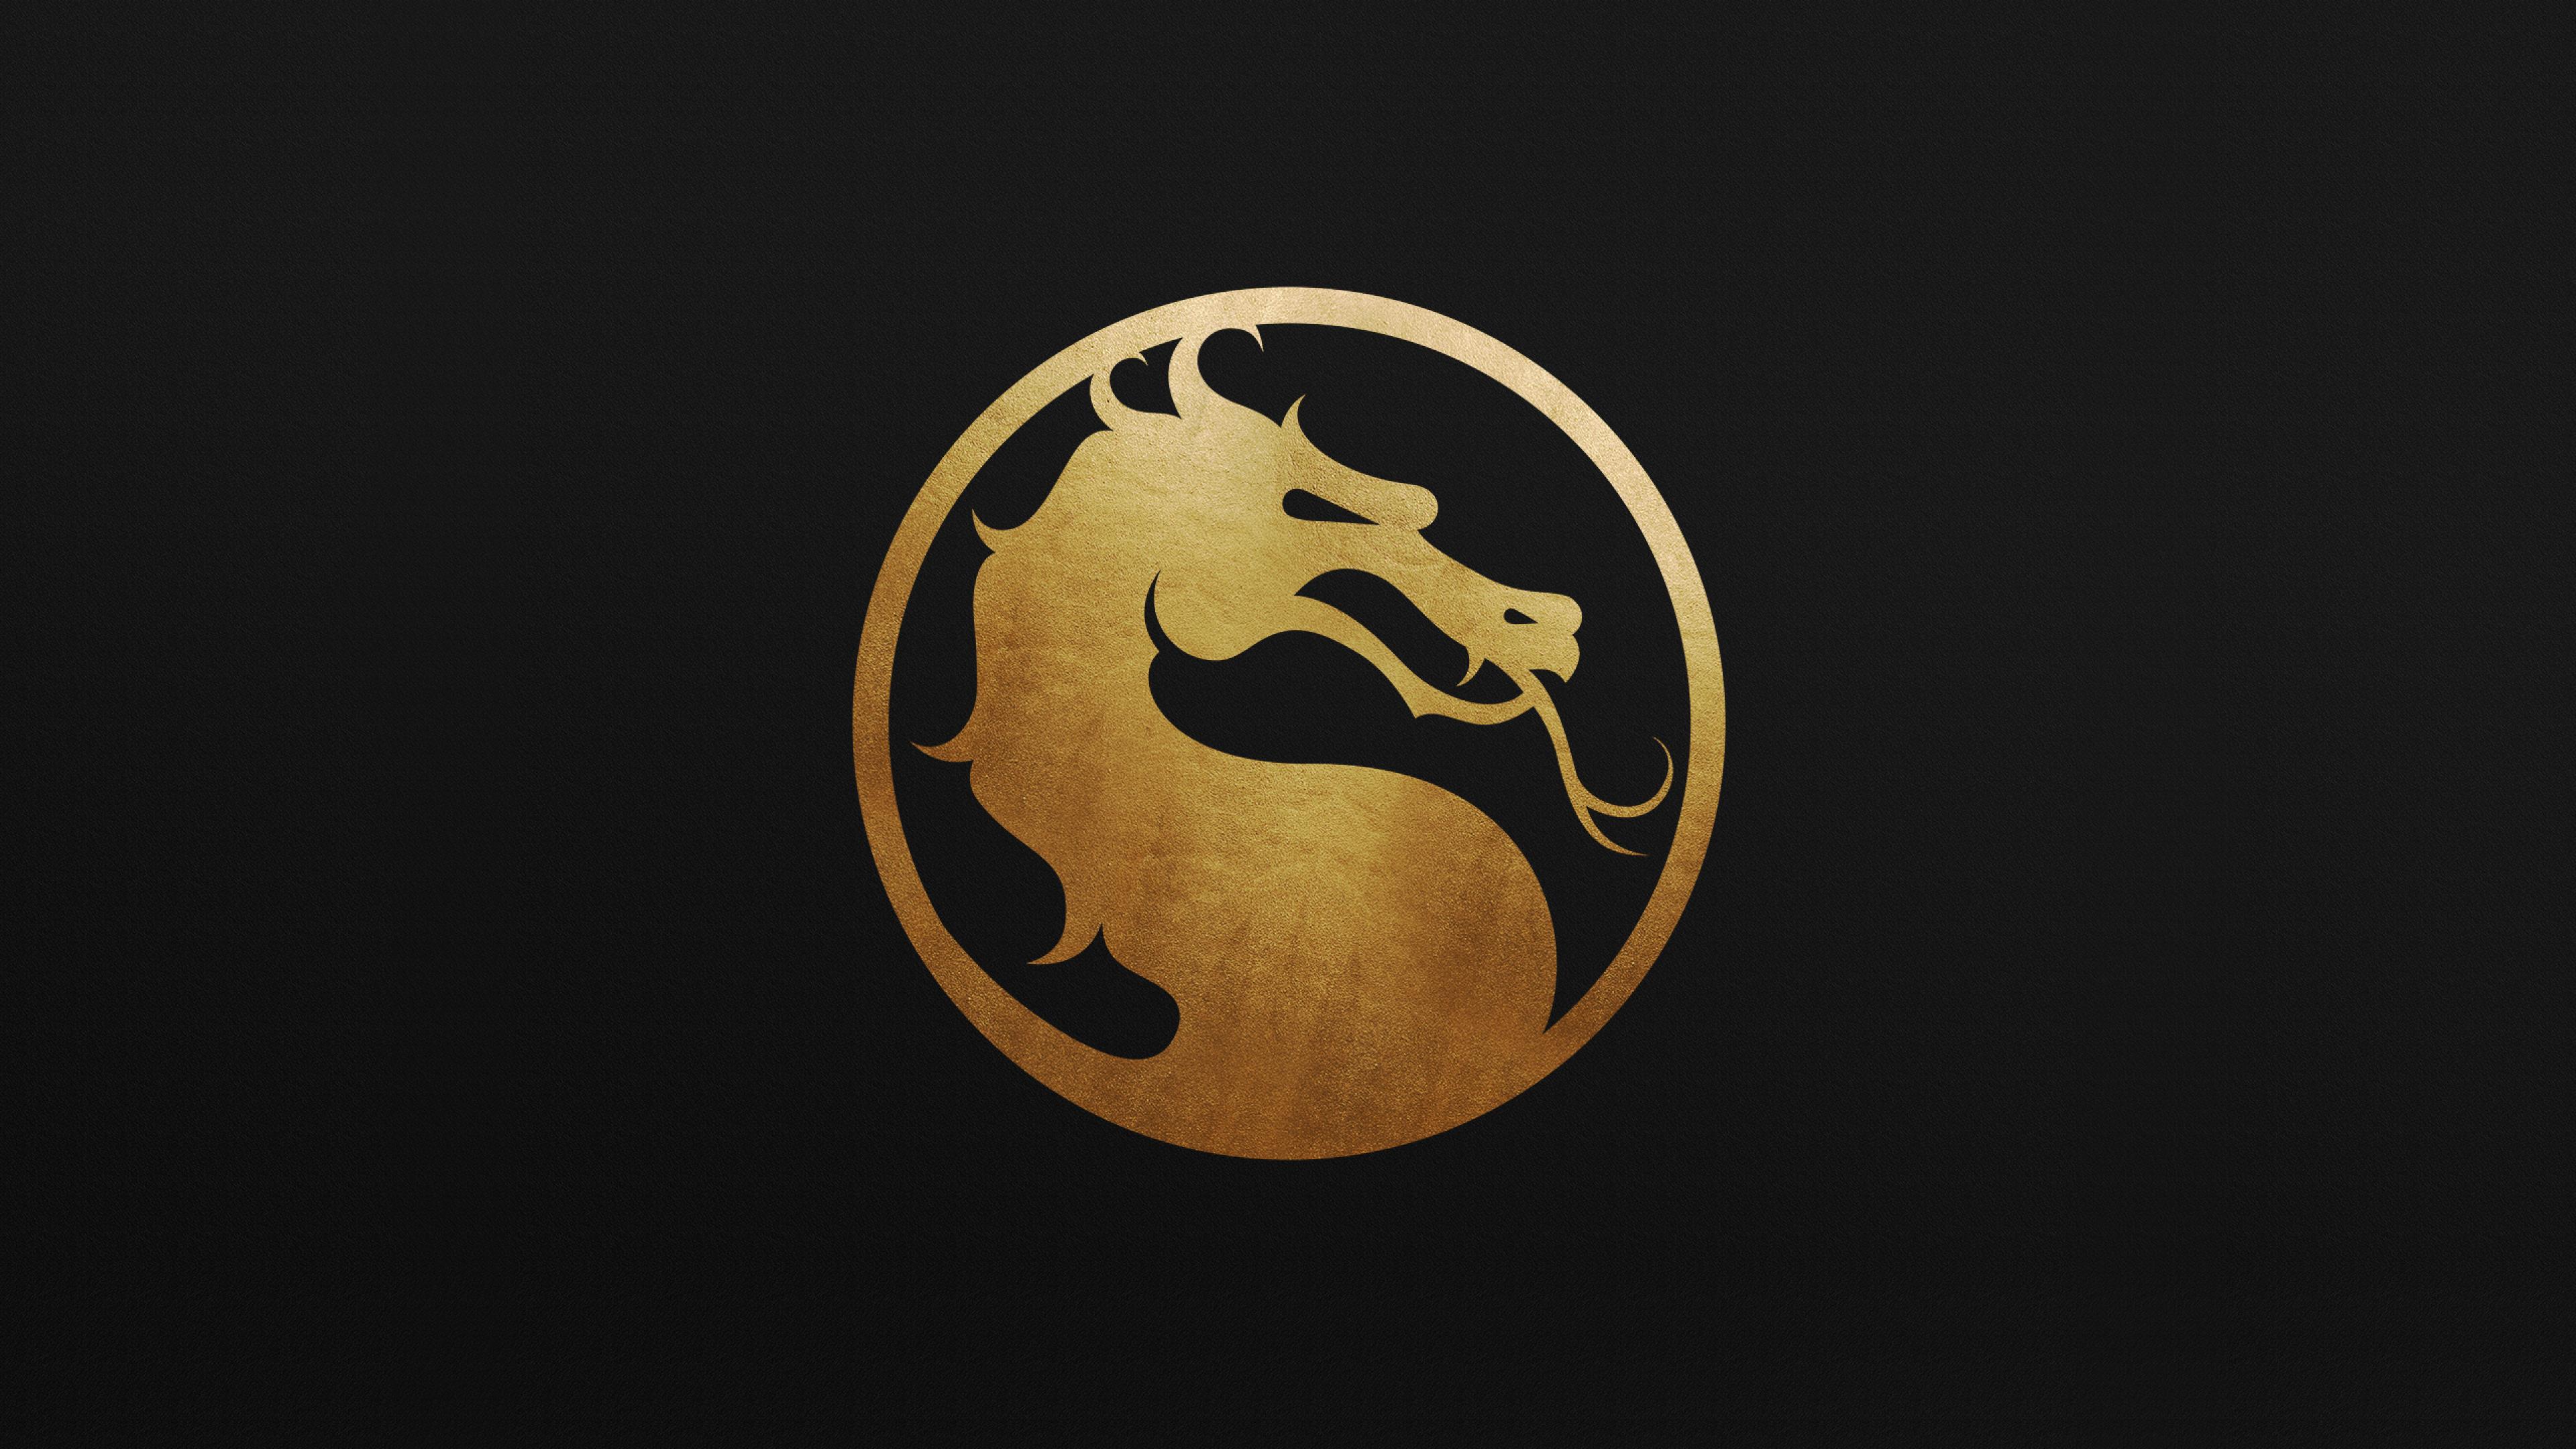 Mortal Kombat 4k Wallpaper Posted By Ryan Simpson